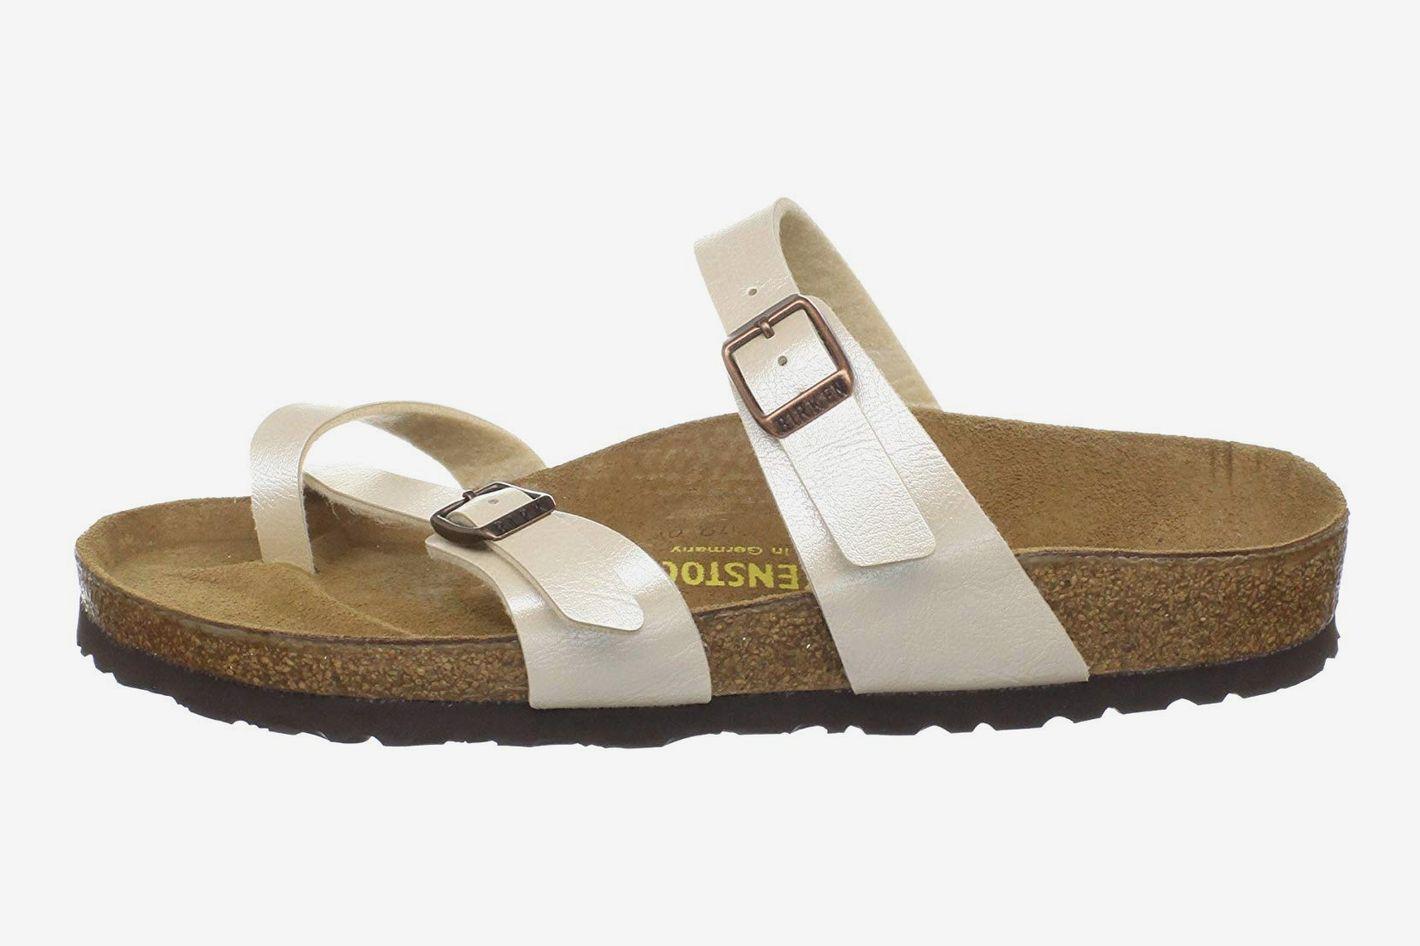 fd076b67bf43 10 Best Women s Sandals 2019 — Flip-flops